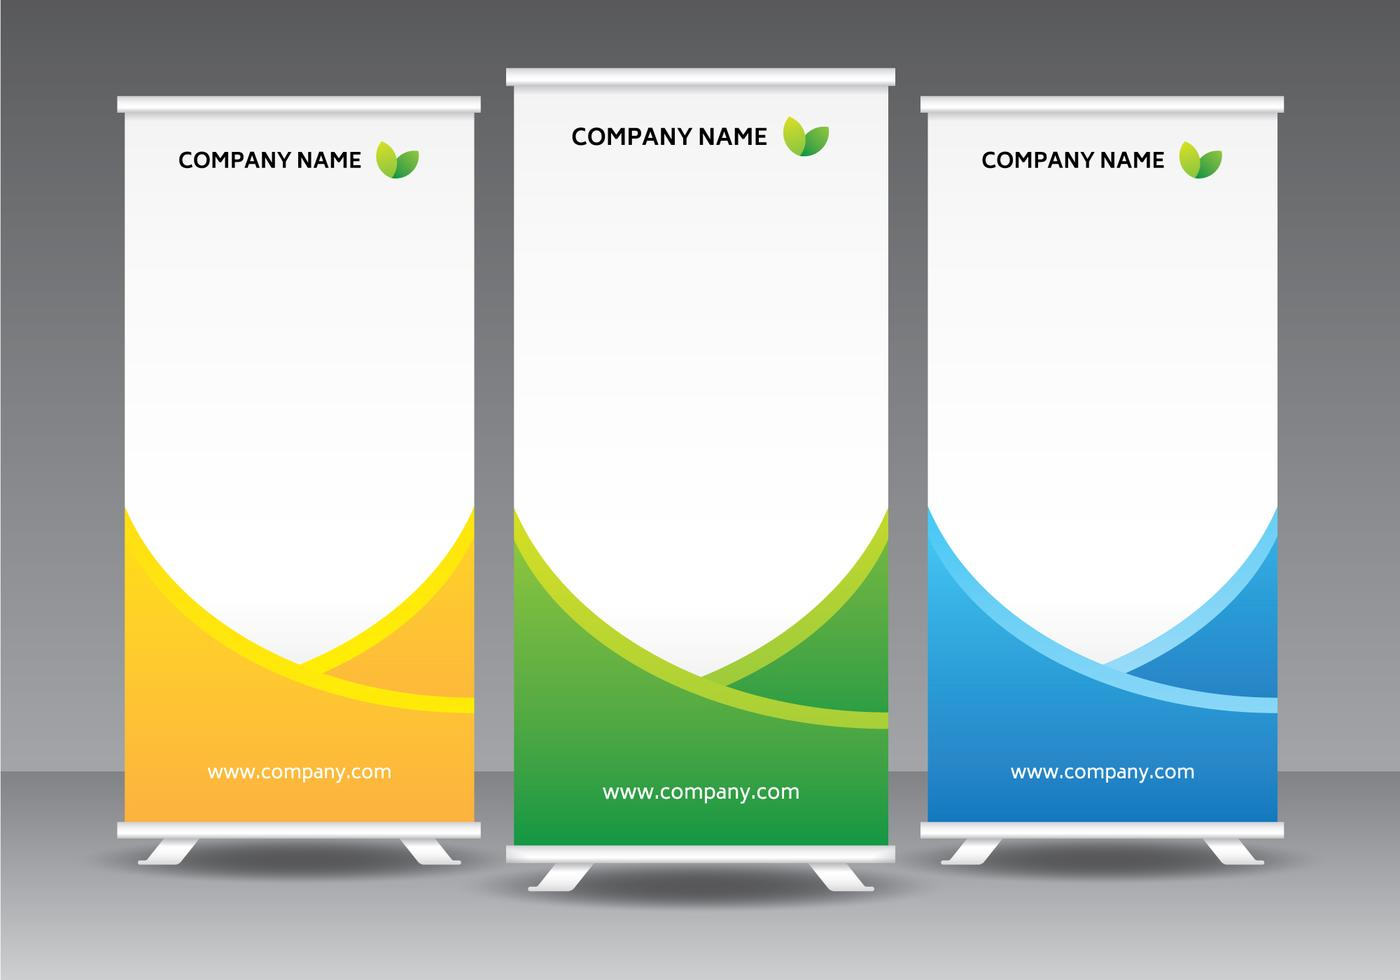 Presentatiewanden – roll up banners – mobiele presentatie systemen